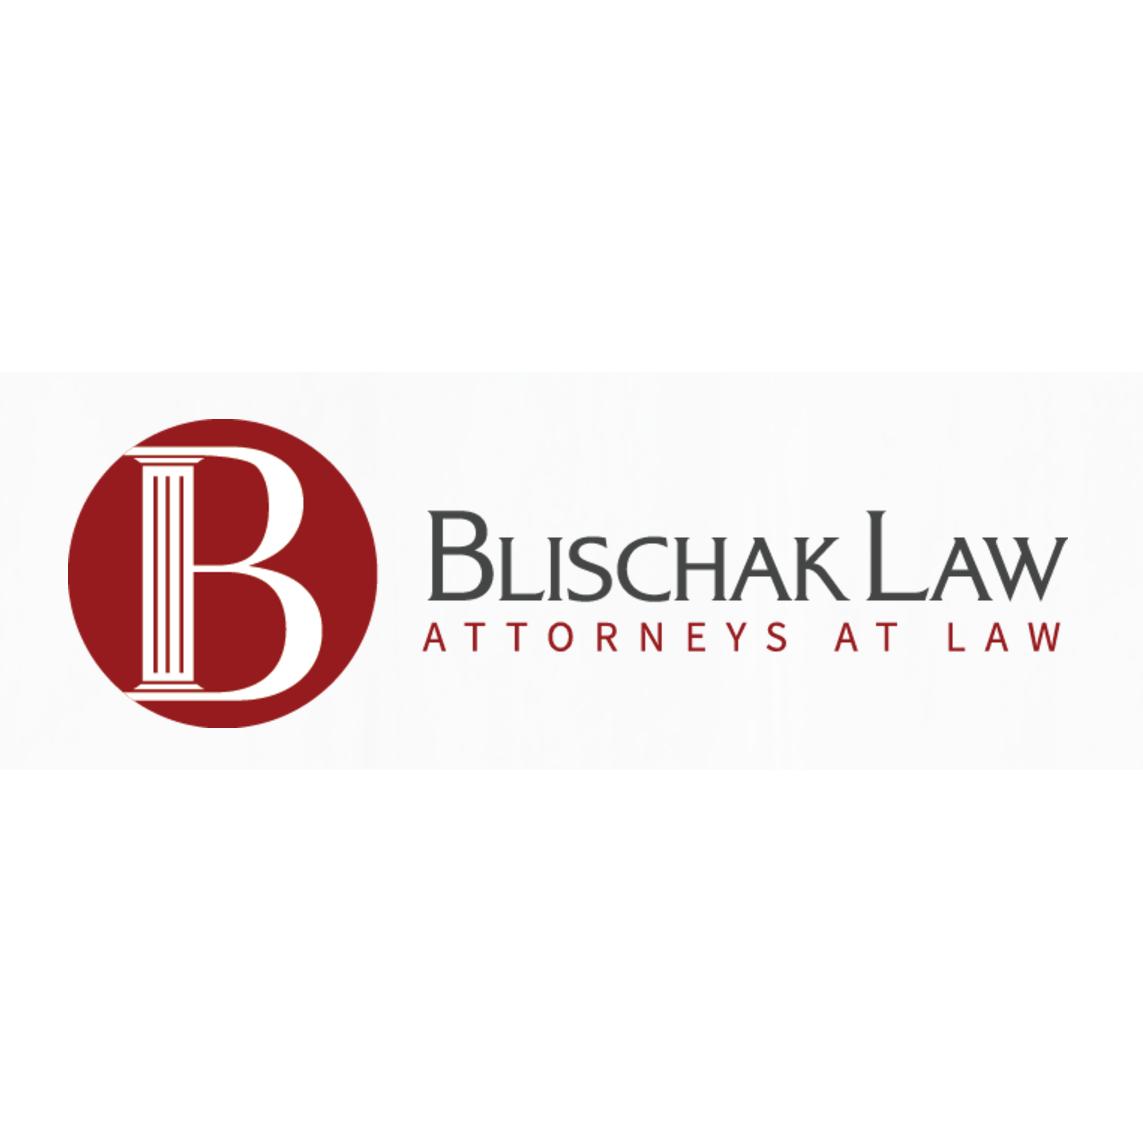 Blischak Law